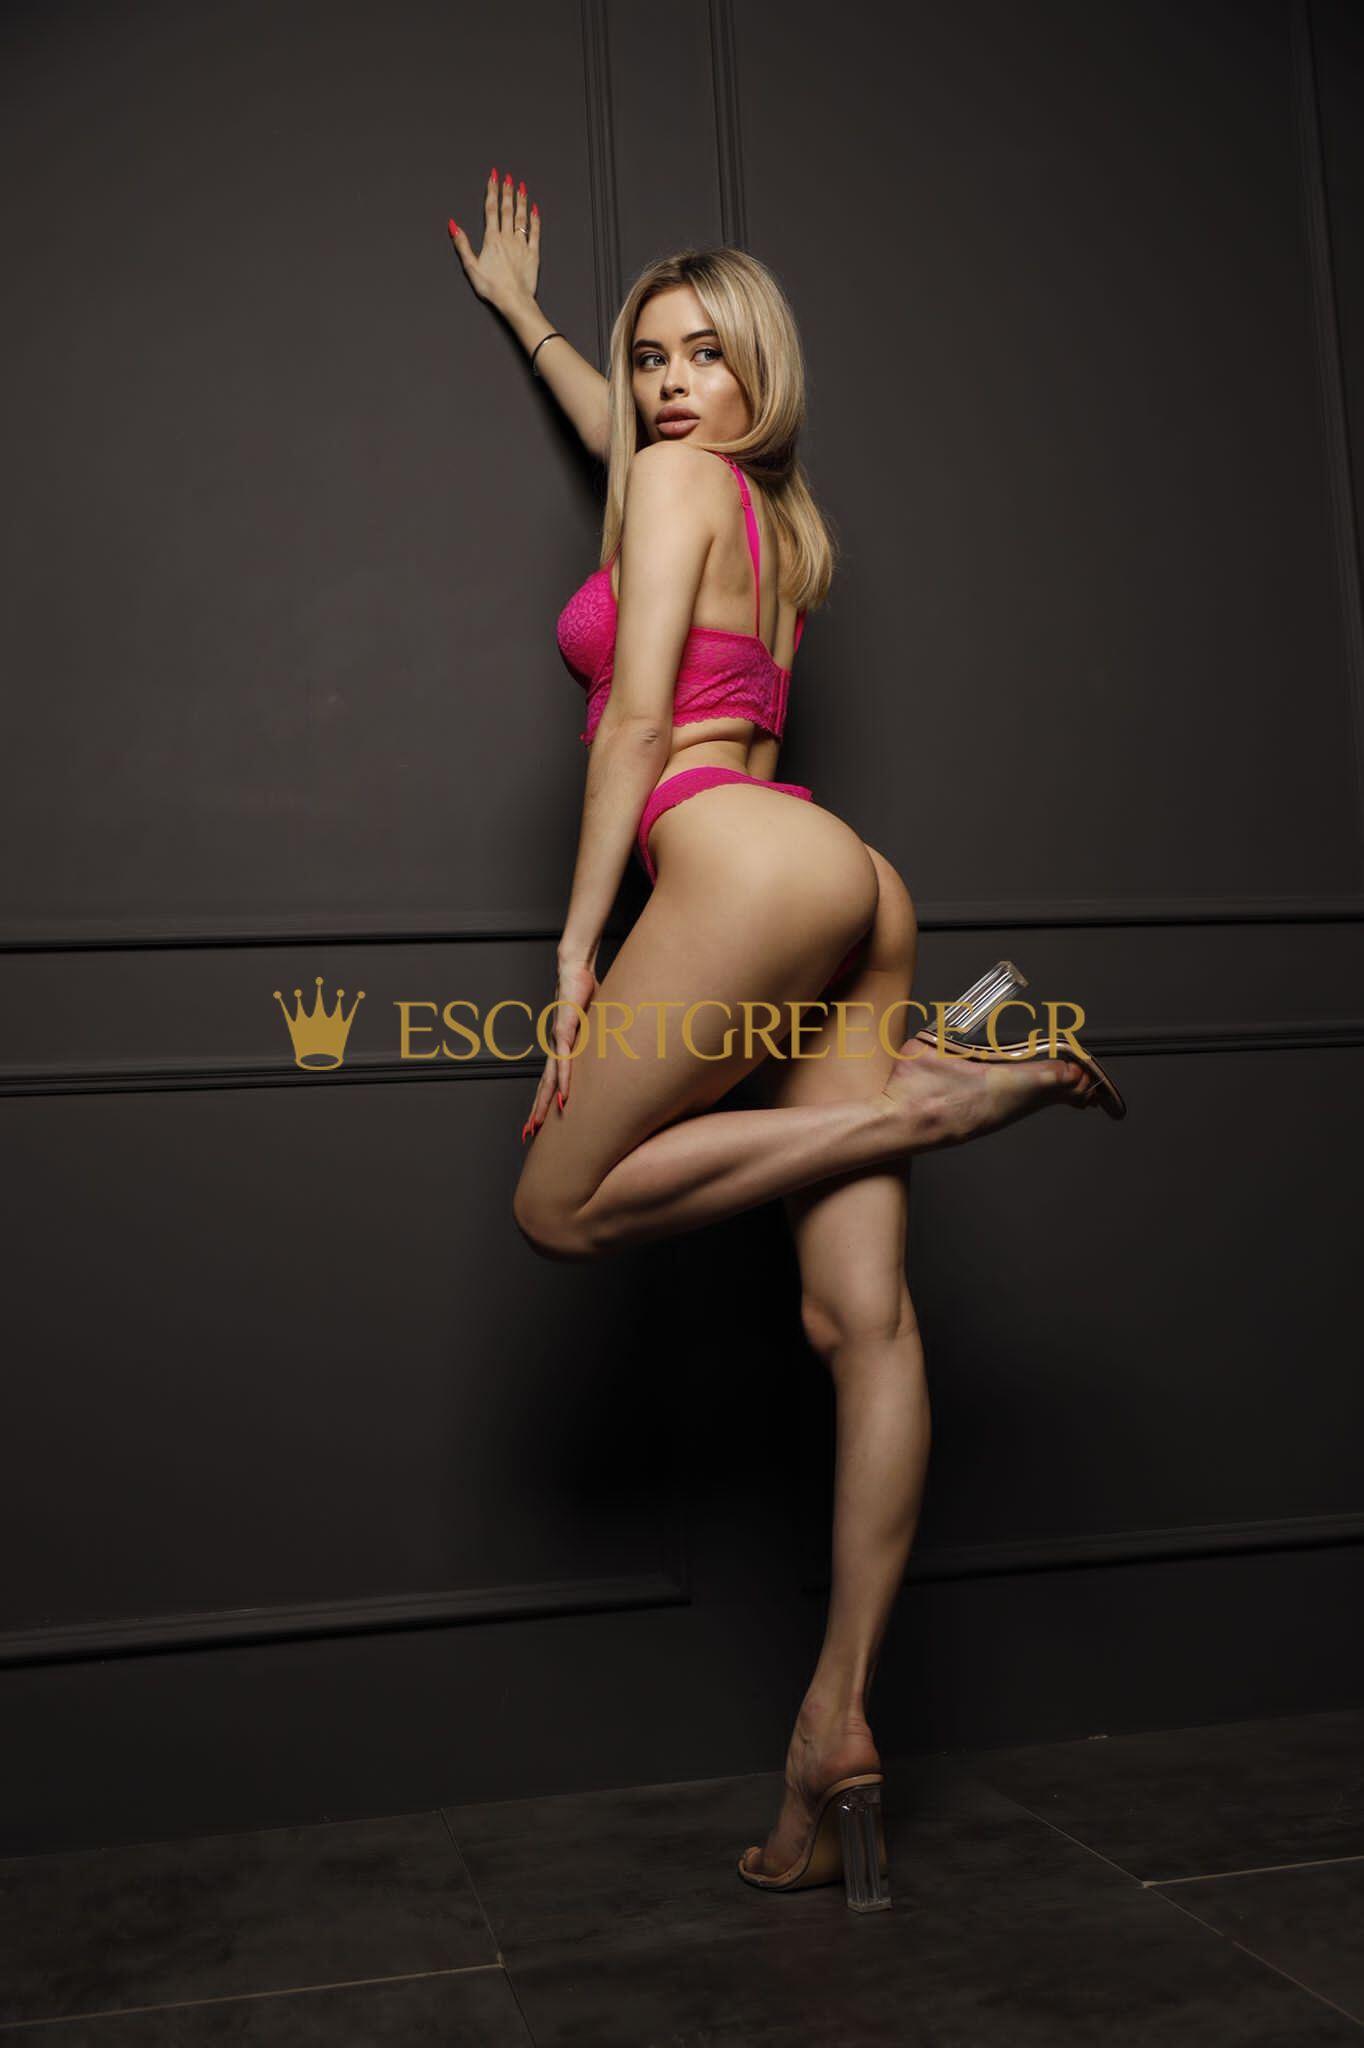 SEXY UKRAINIAN ESCORT CINDY